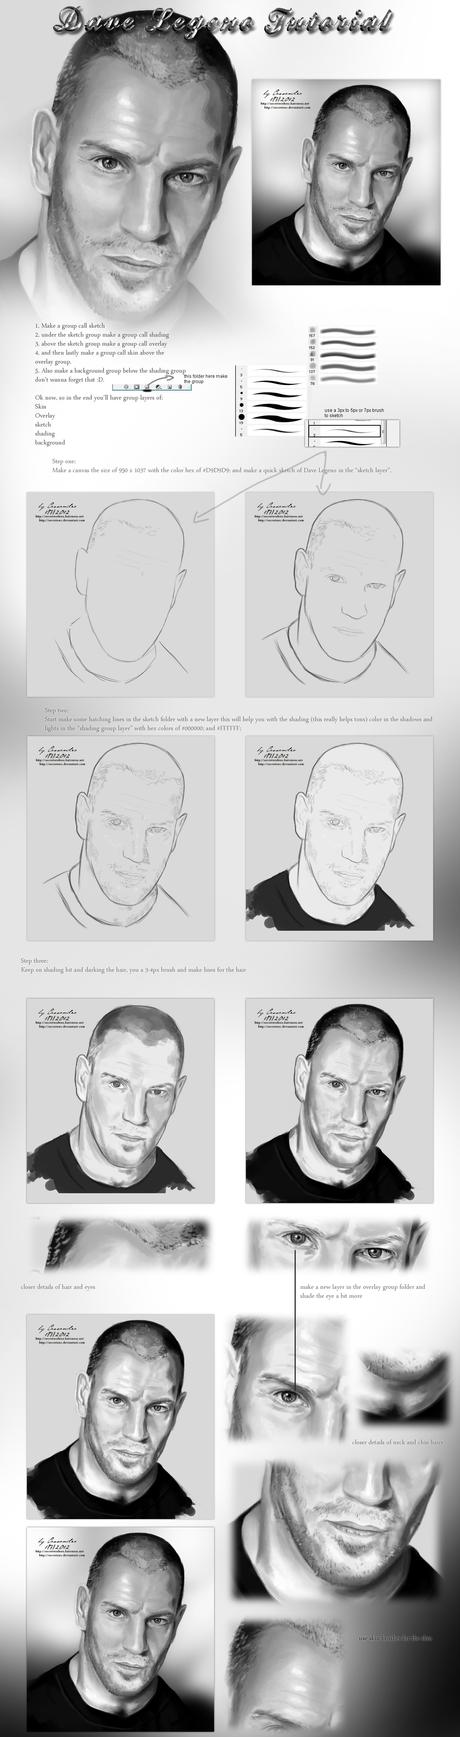 Dave Legeno tutorial by secretSWC